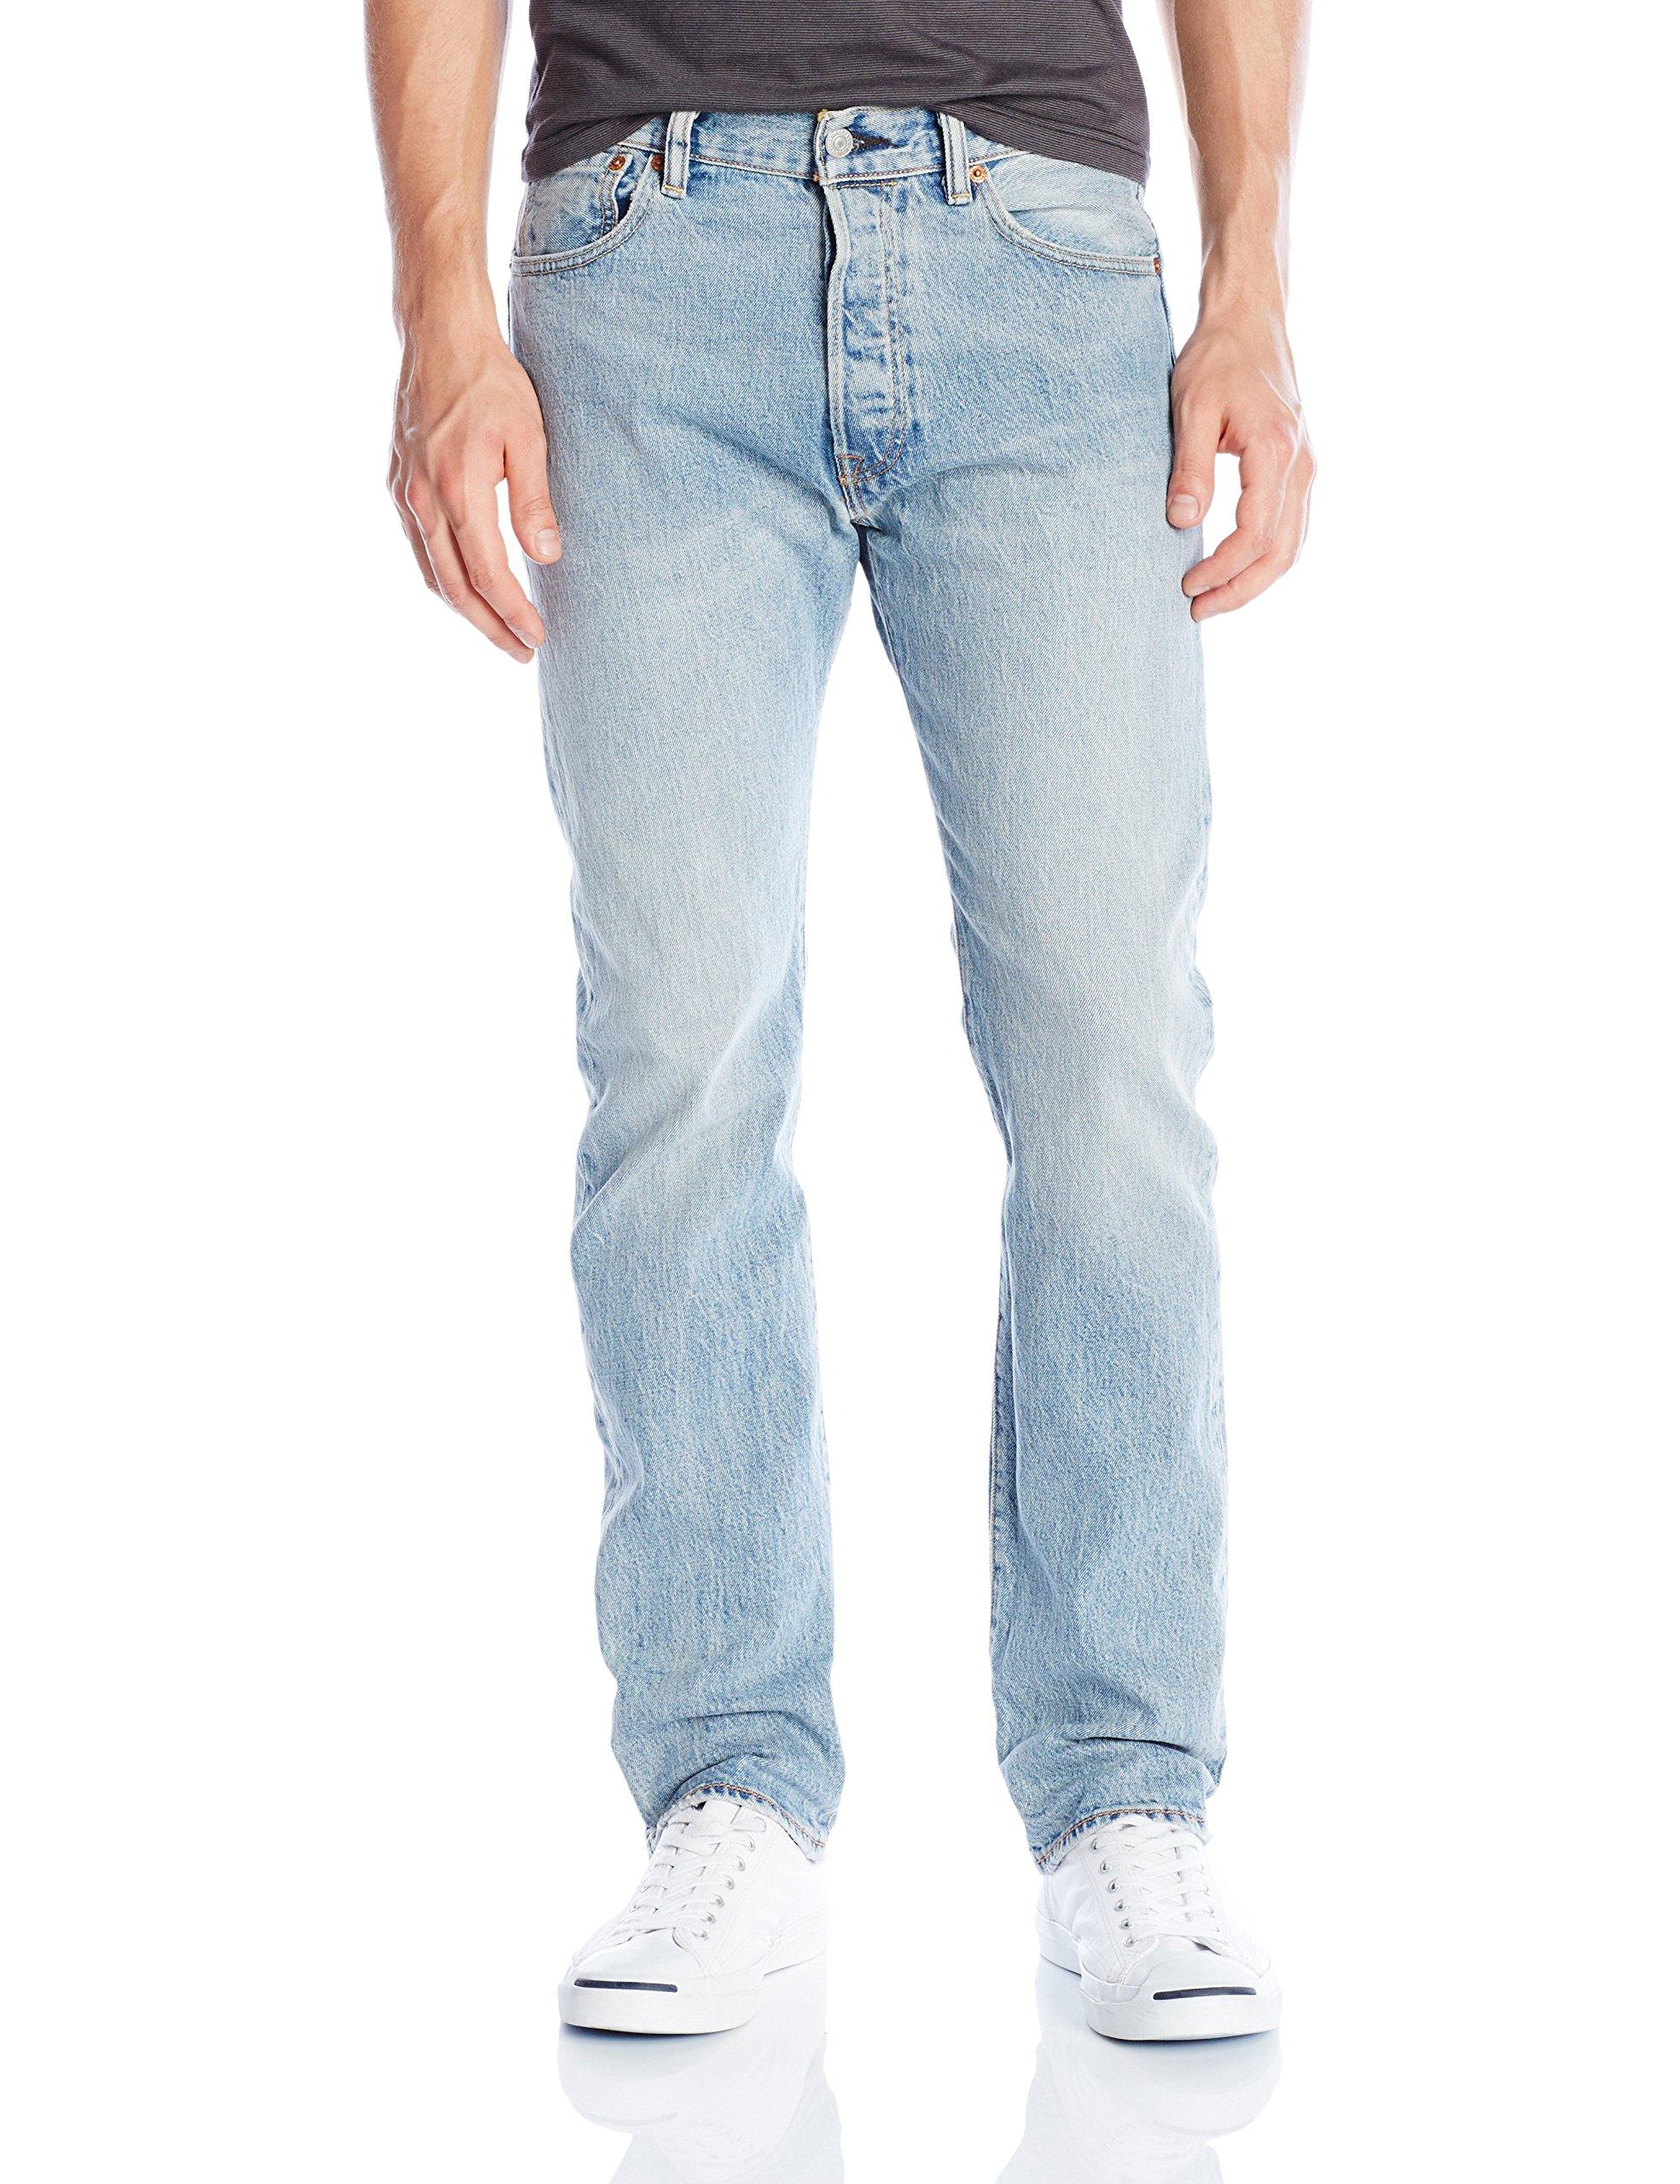 Levi's Men's 501 Original Fit Jean, O'neill/stretch, 31Wx30L